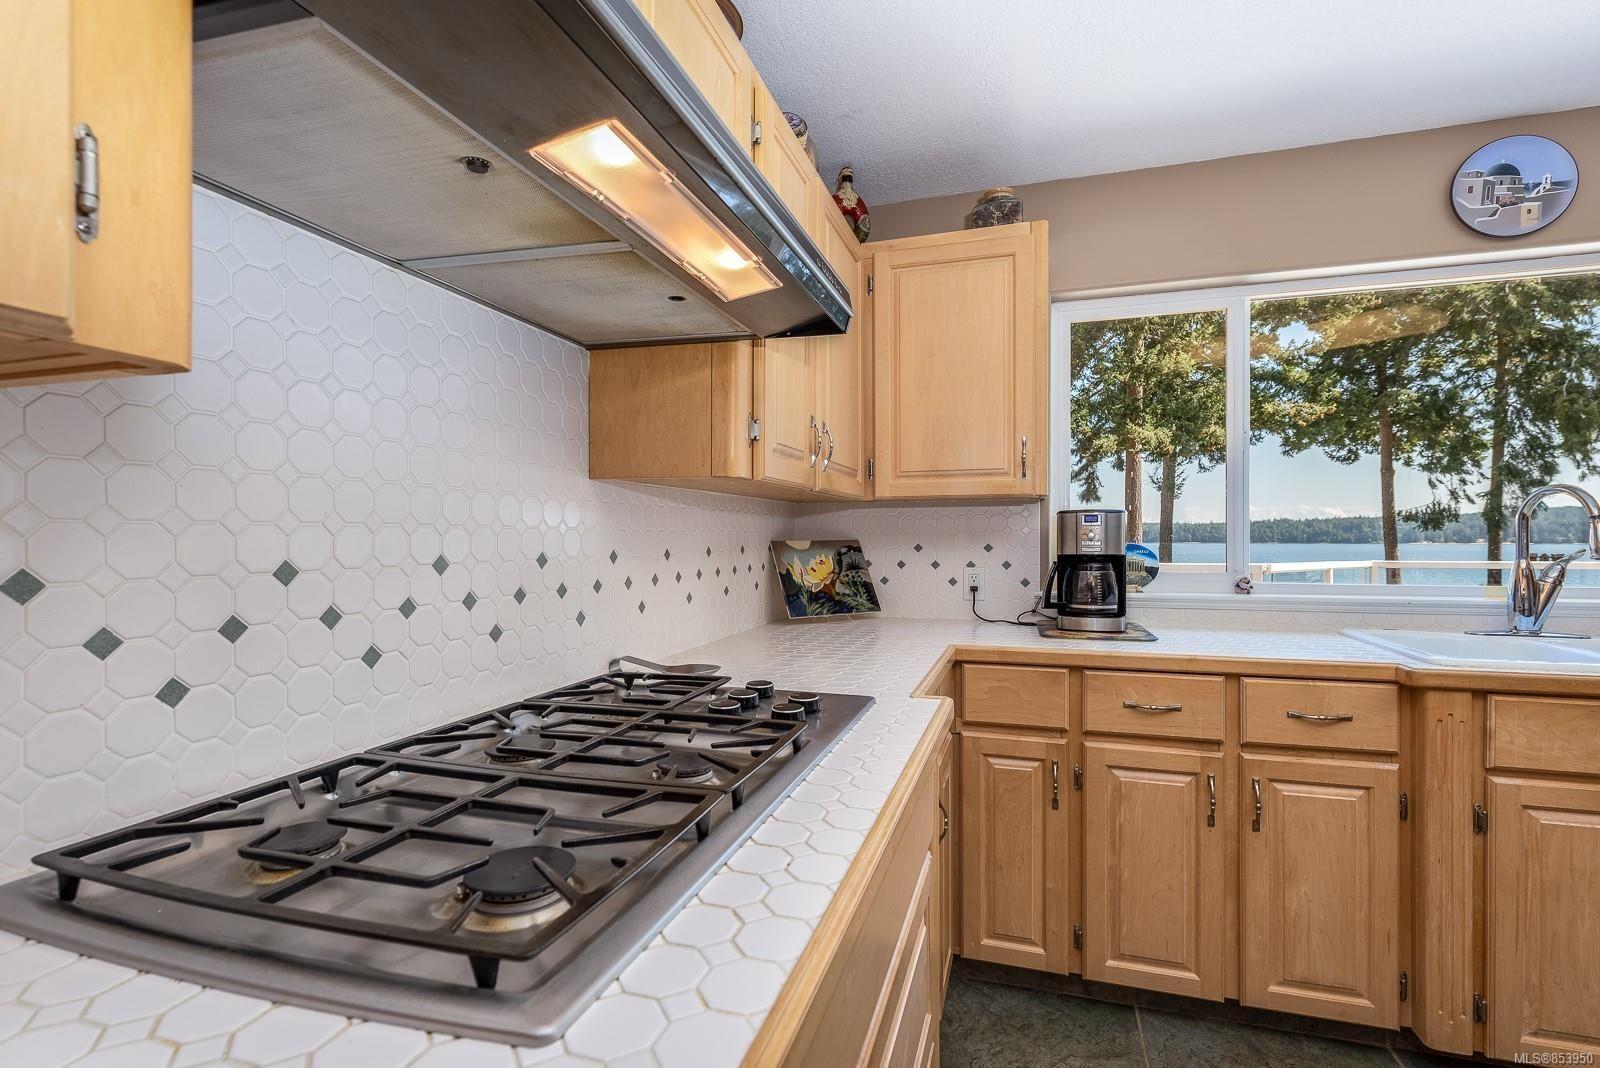 Photo 16: Photos: 5880 GARVIN Rd in : CV Union Bay/Fanny Bay House for sale (Comox Valley)  : MLS®# 853950